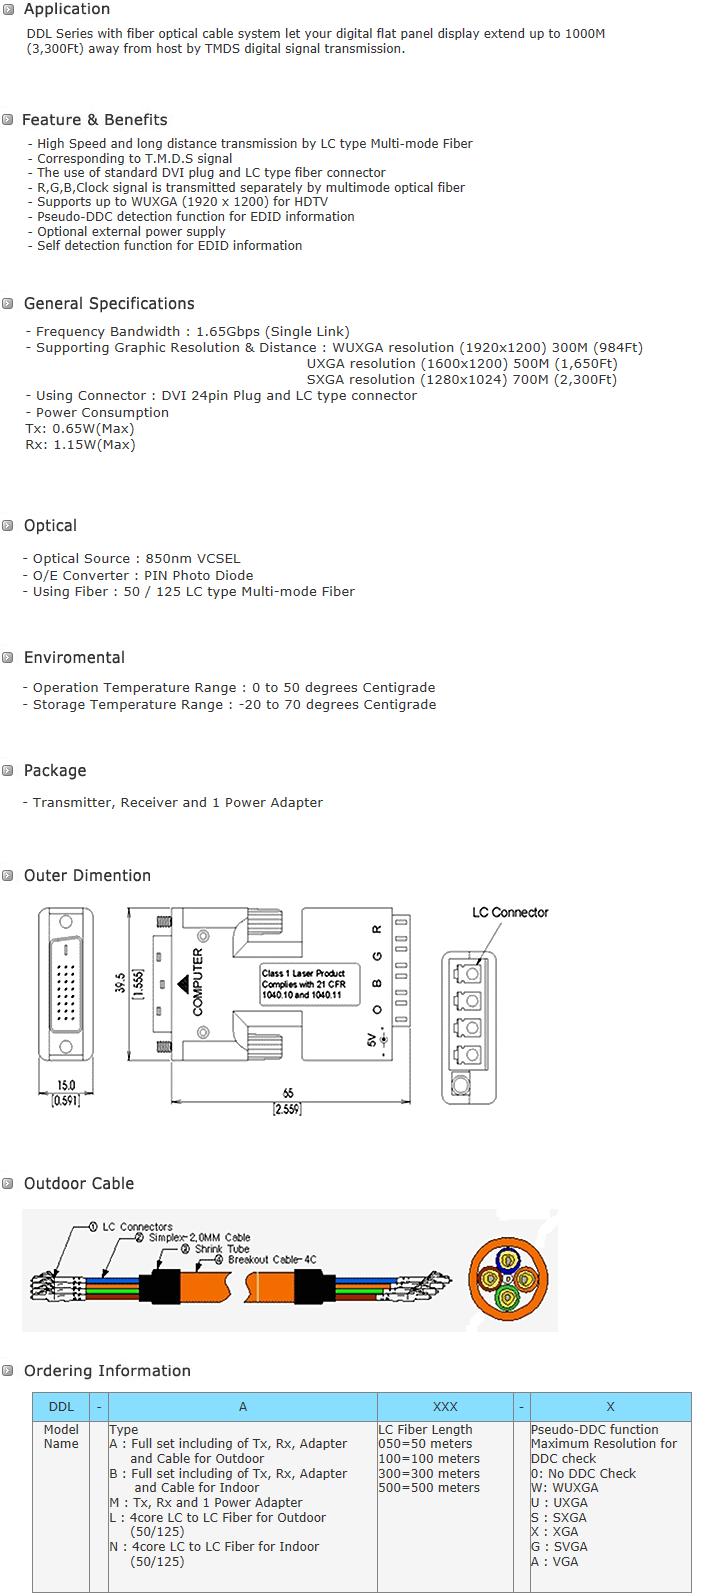 Shinkwang I&C DVI Module DDL Series